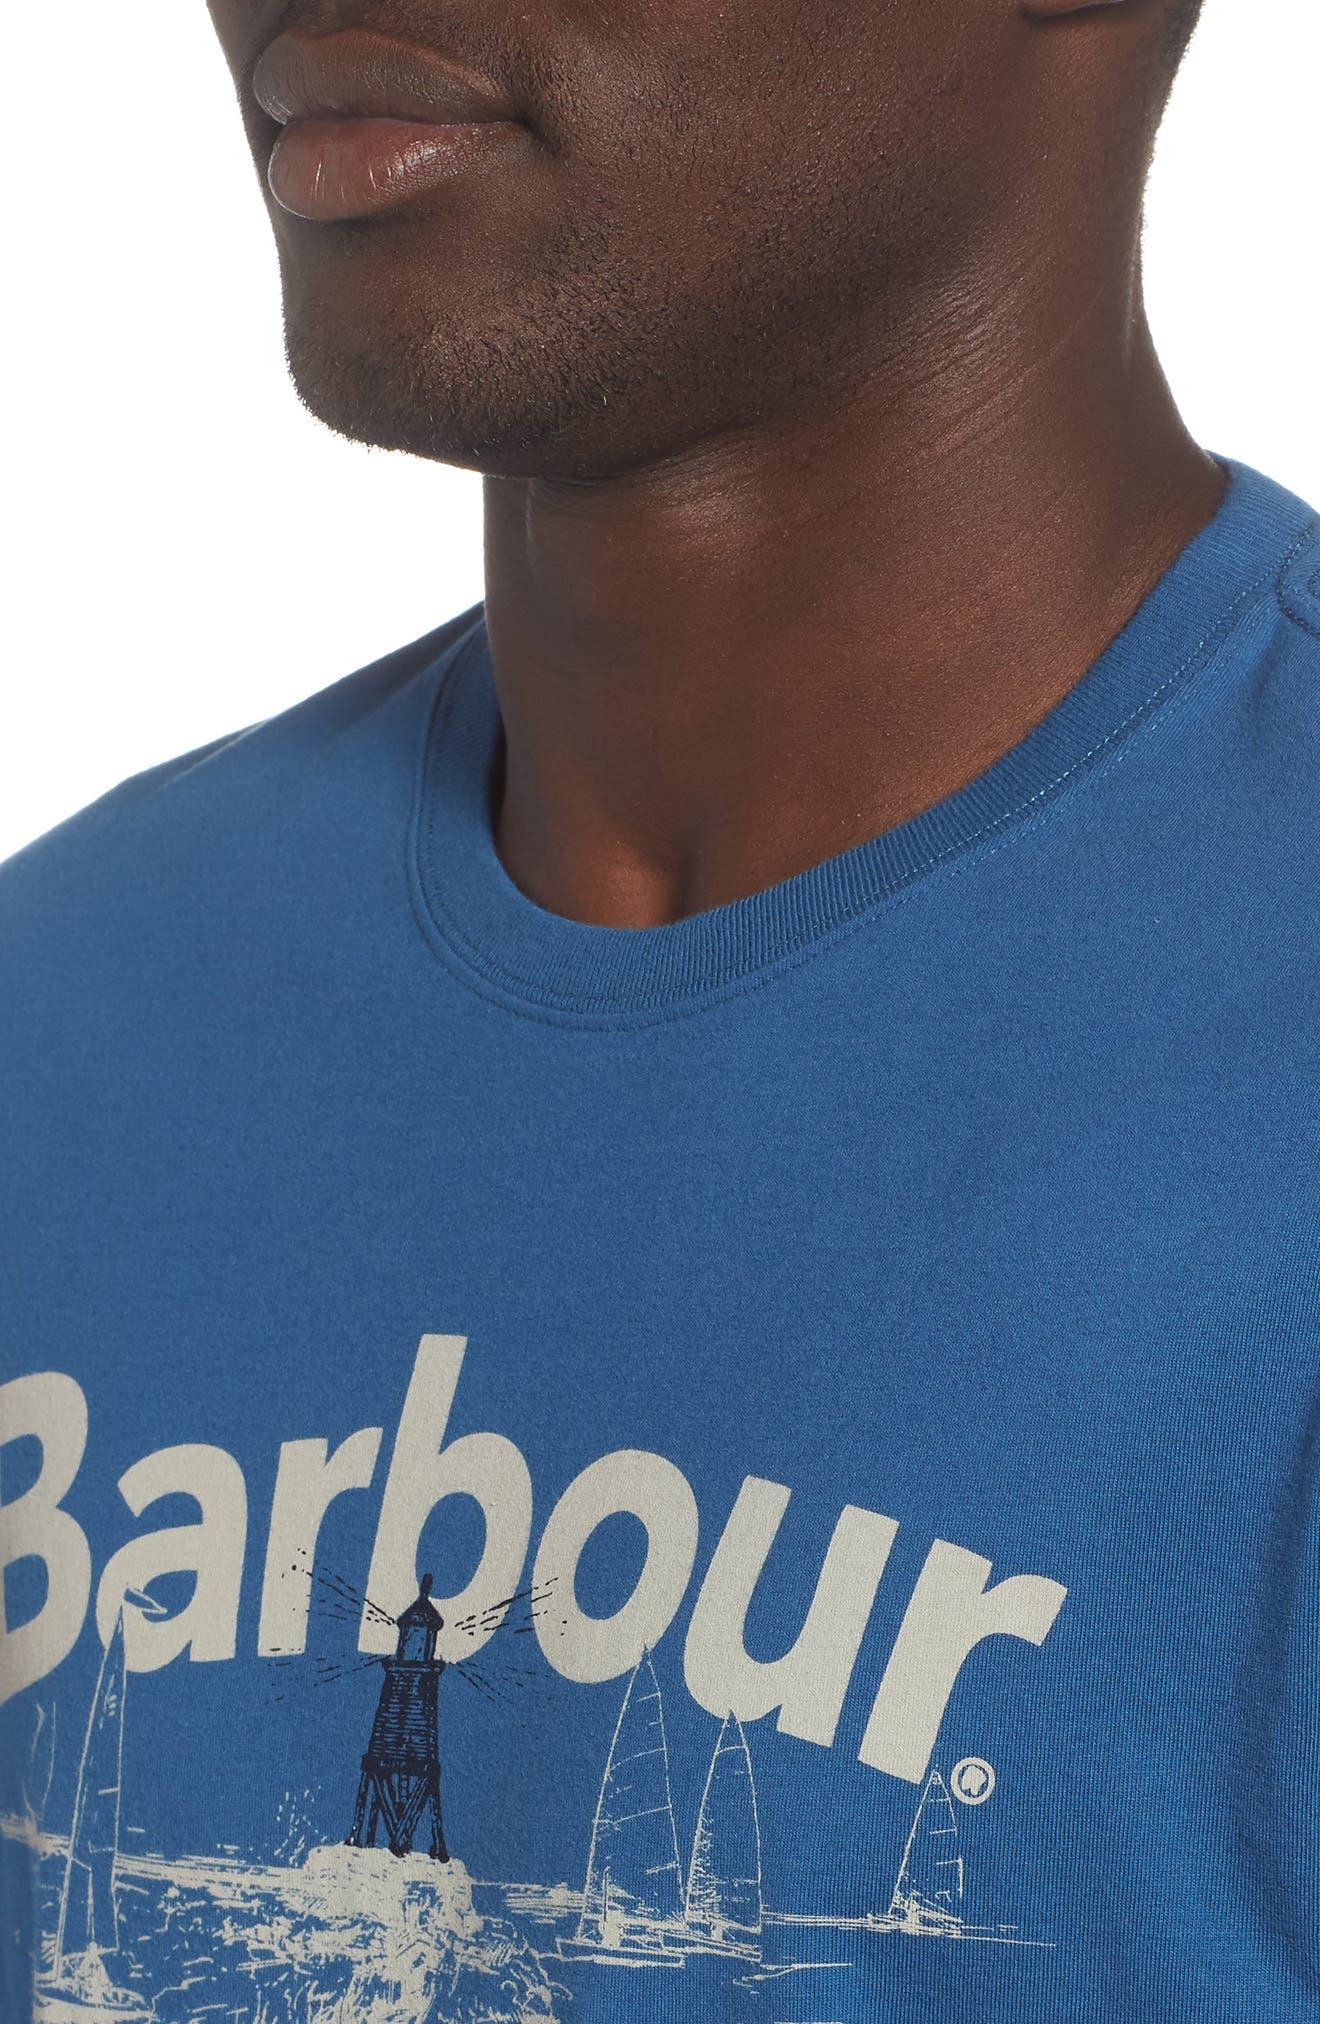 Waterline Graphic T-Shirt,                             Alternate thumbnail 4, color,                             Sea Blue